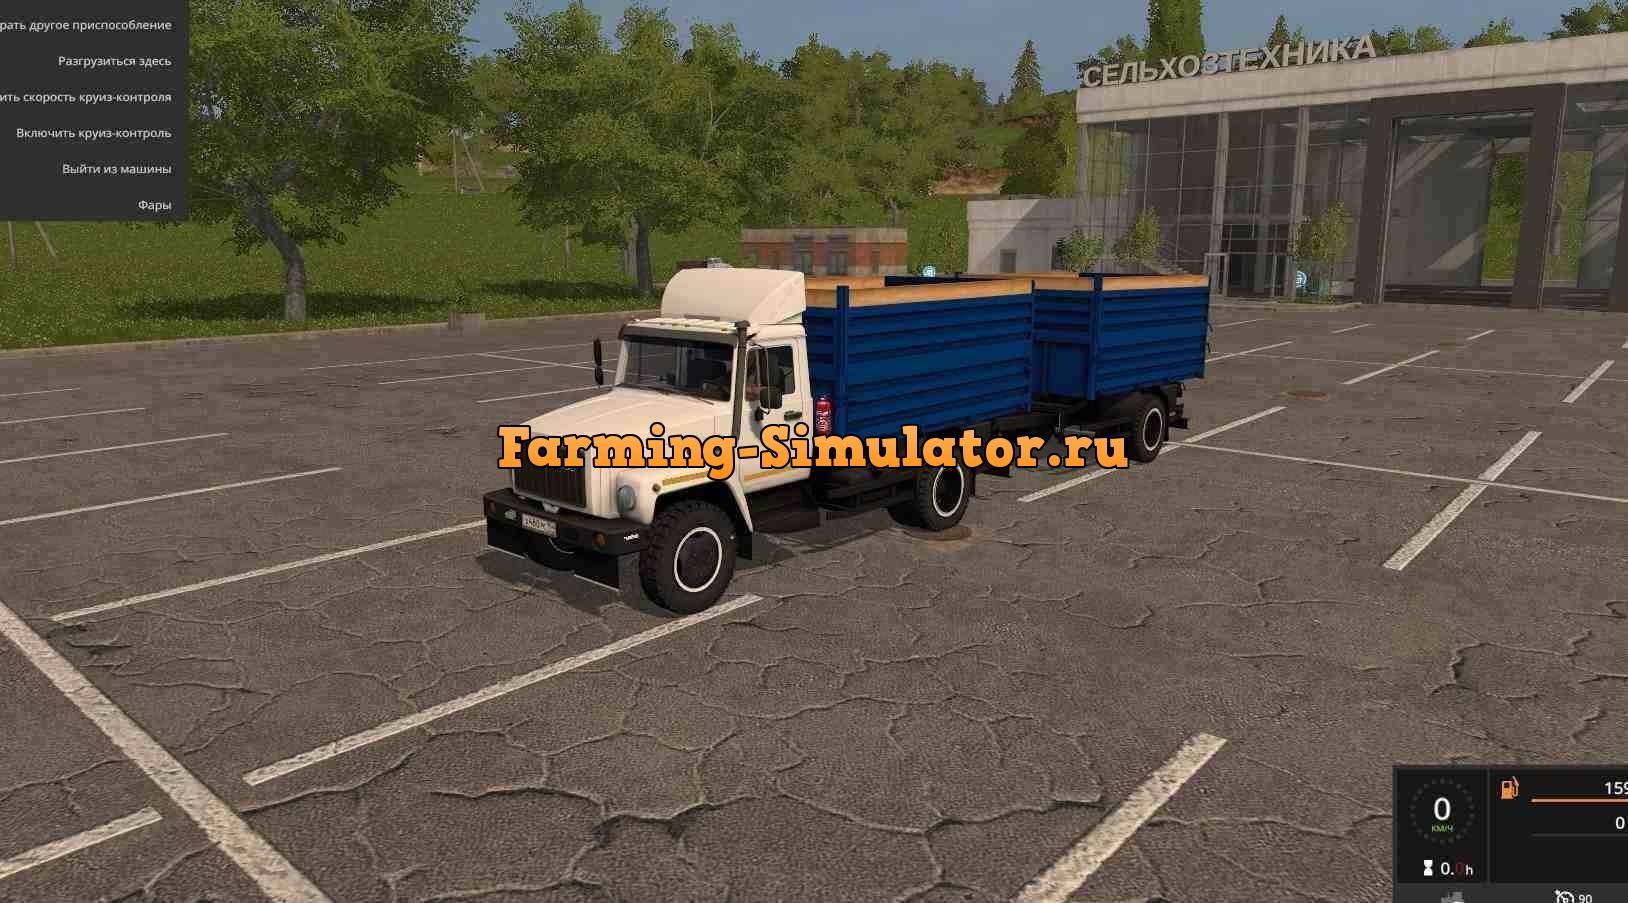 Мод ПАК Грузовик ГАЗ 35071 + САЗ 83173 Фермер Симулятор 2017